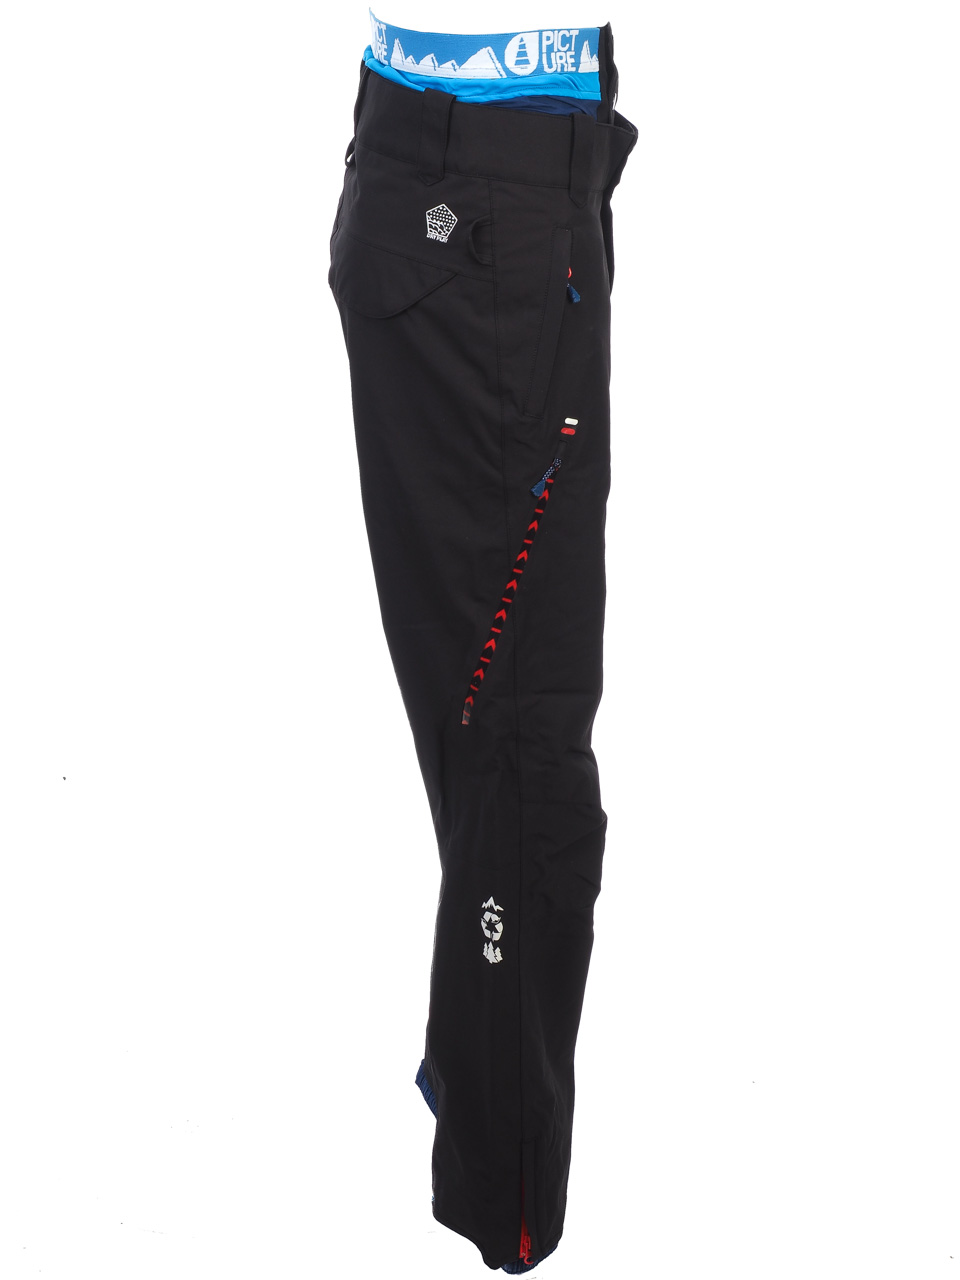 Pantalon-de-ski-surf-Picture-Base-blk-pant-fit-ski-Noir-67948-Neuf miniature 2